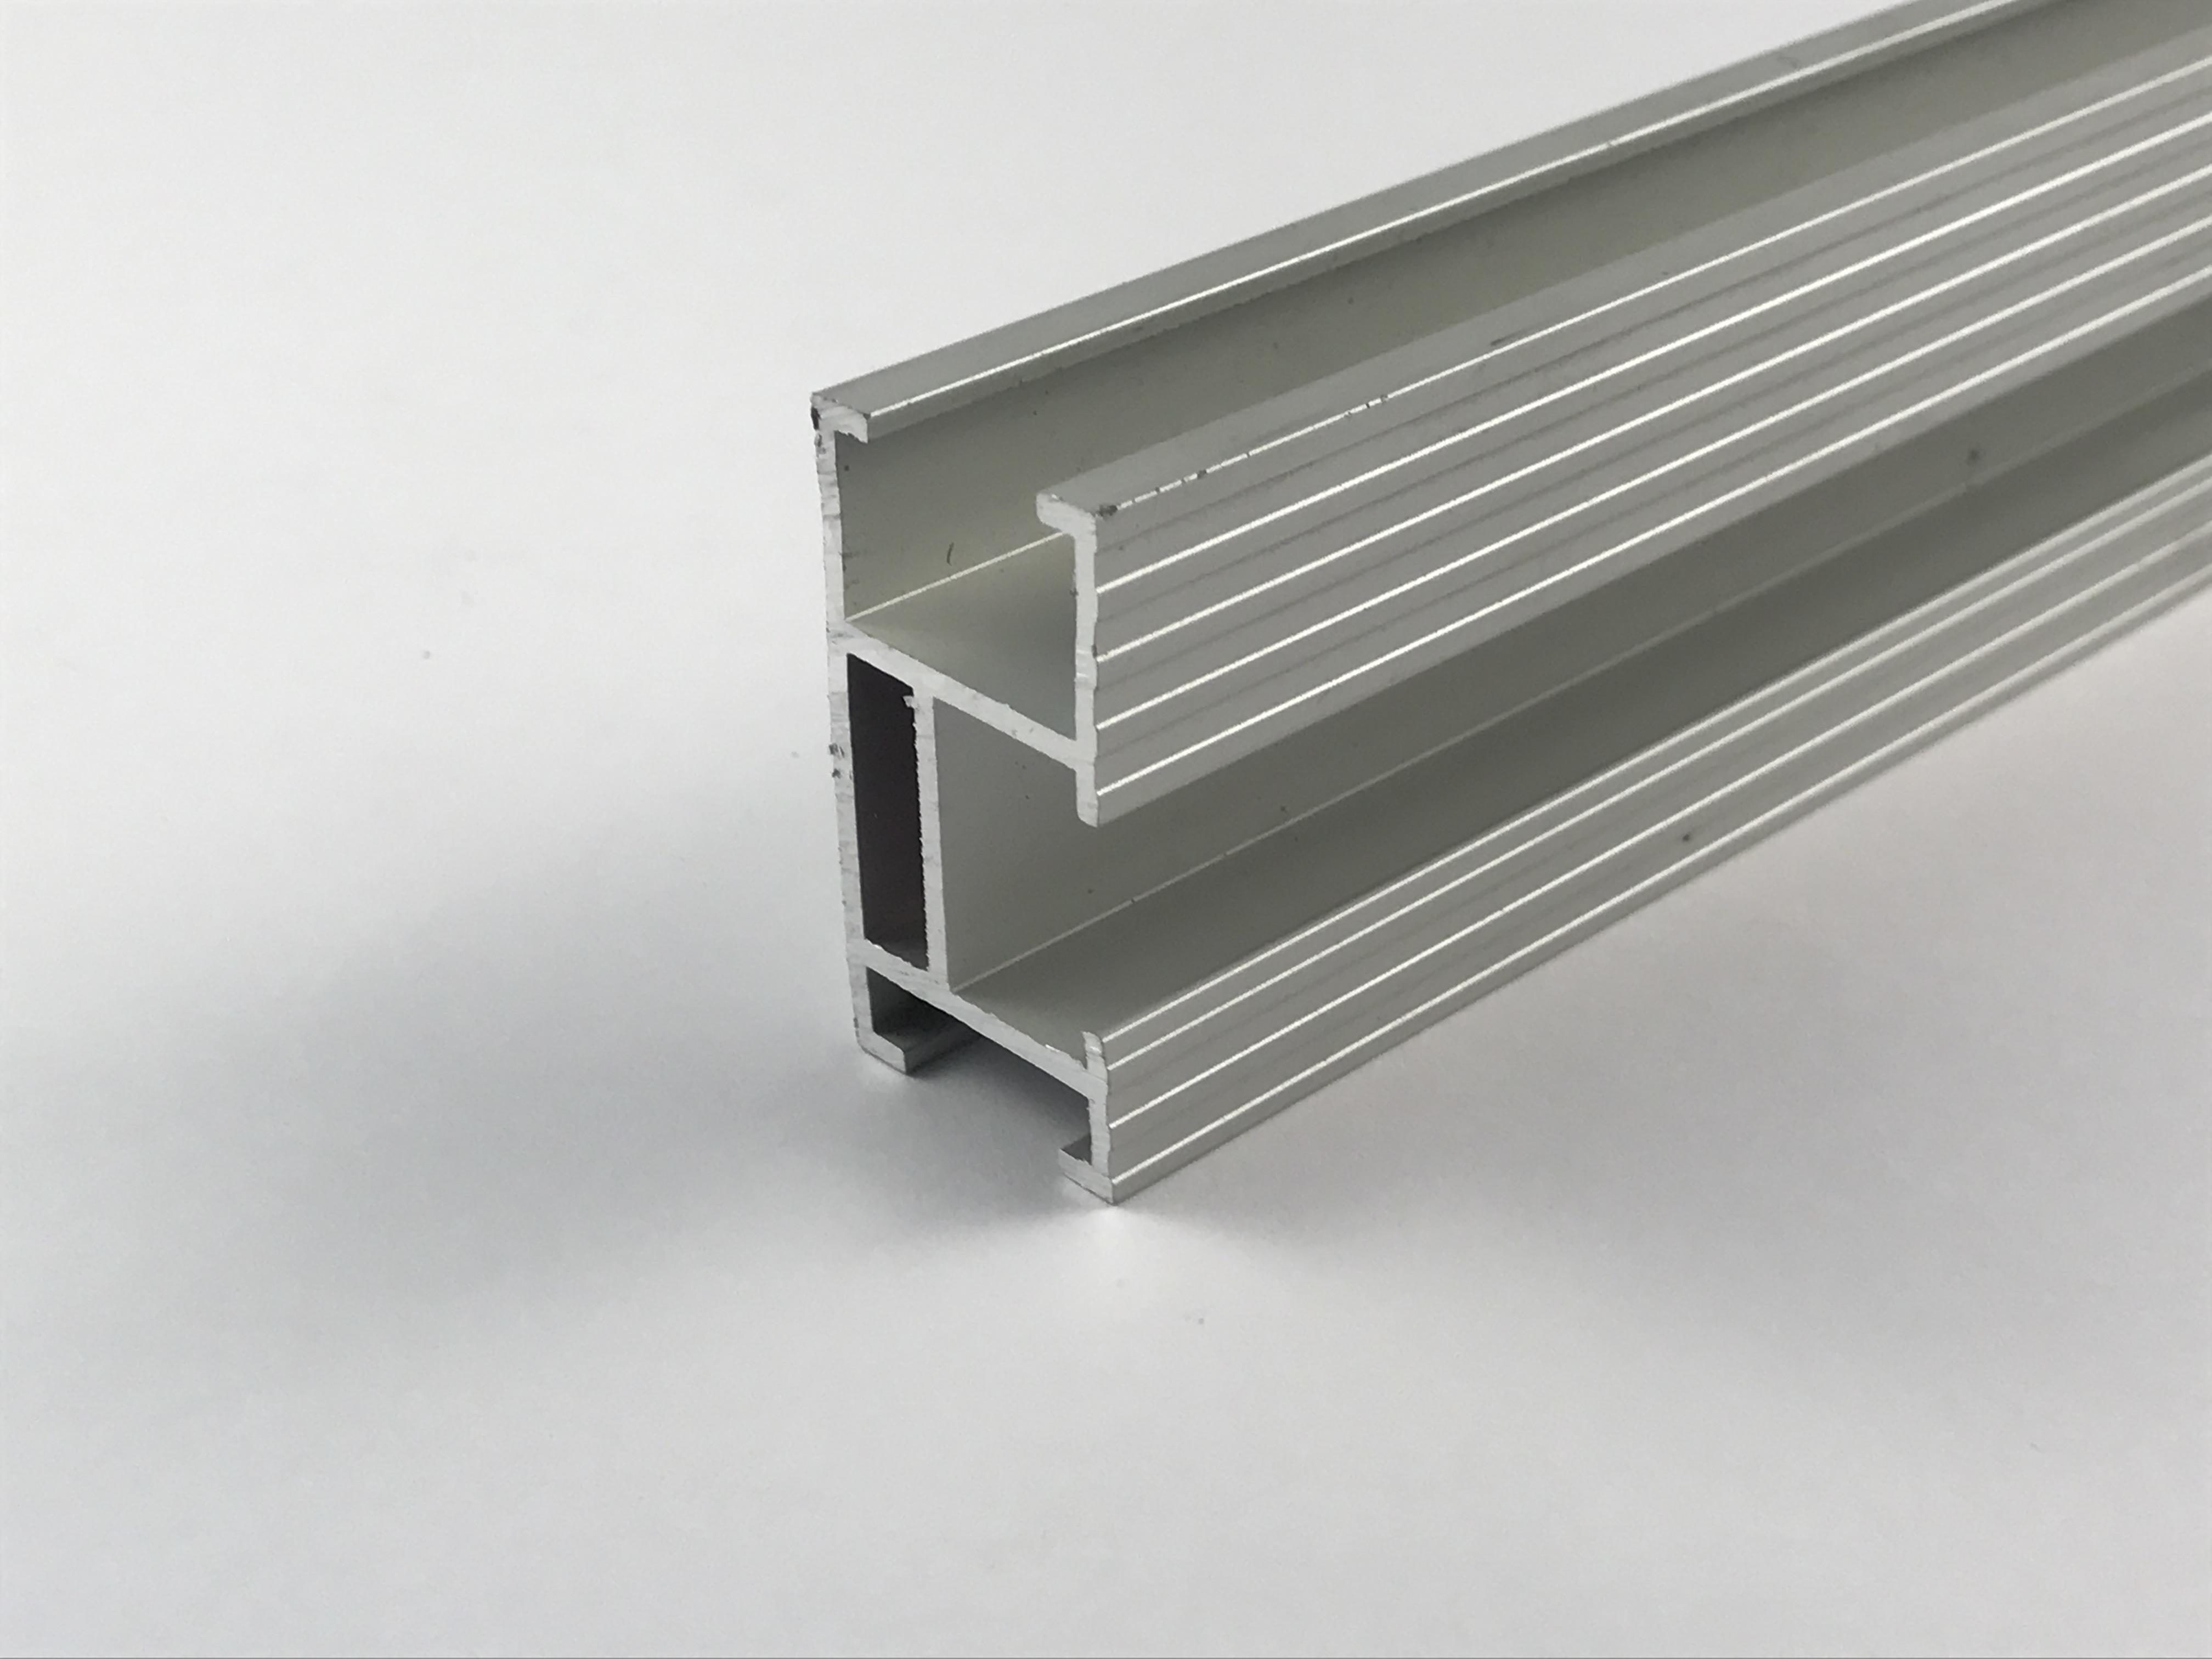 4.2m Solarframe Mounting Rail Image